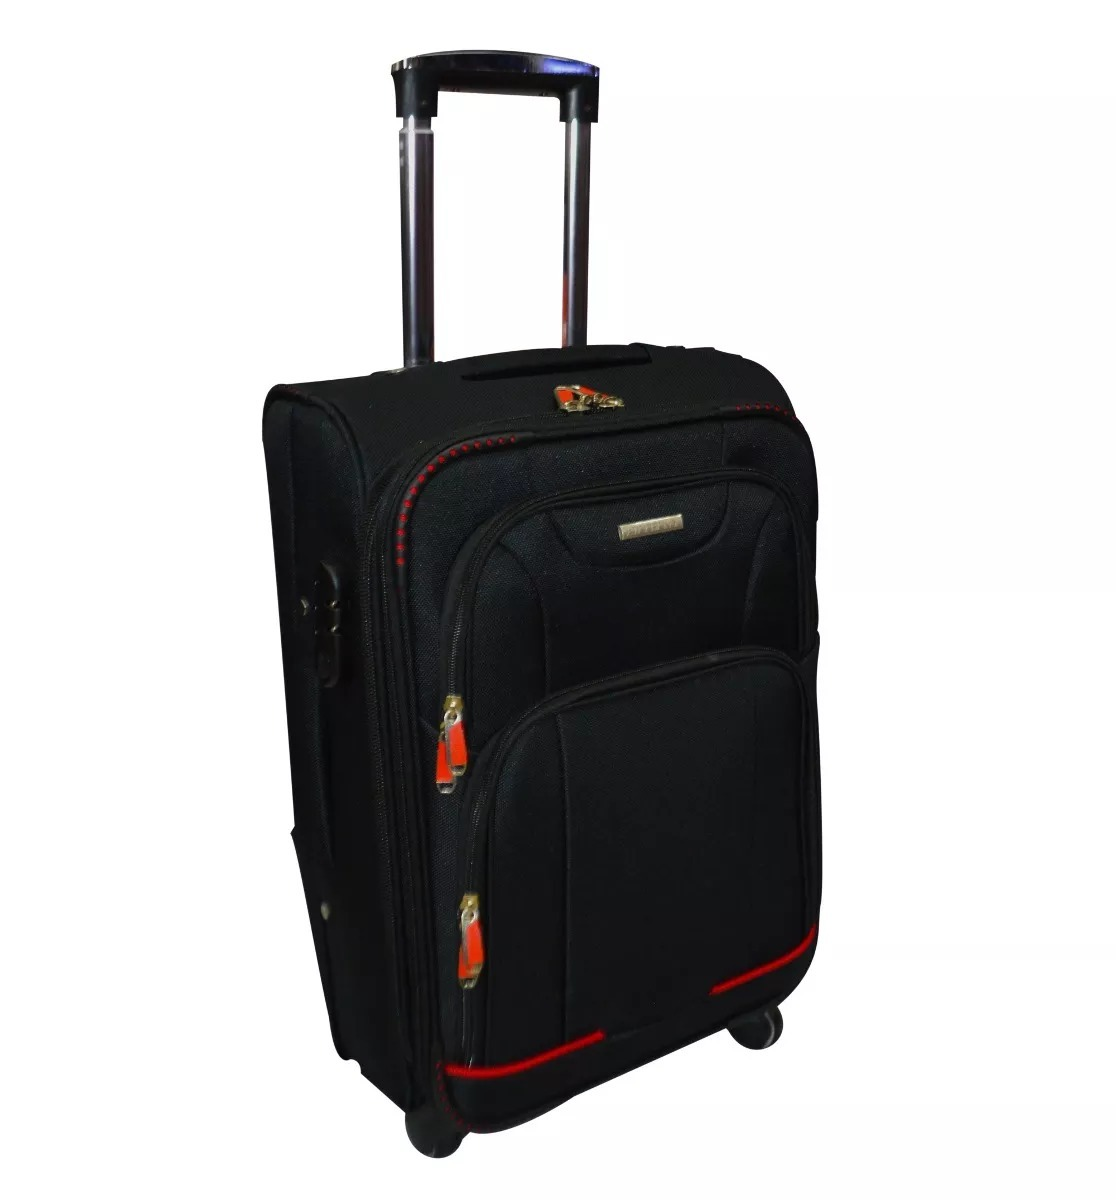 b32d0167805 maleta viaje grande 24 pulgadas ruedas resistente nuevo o. Cargando zoom.